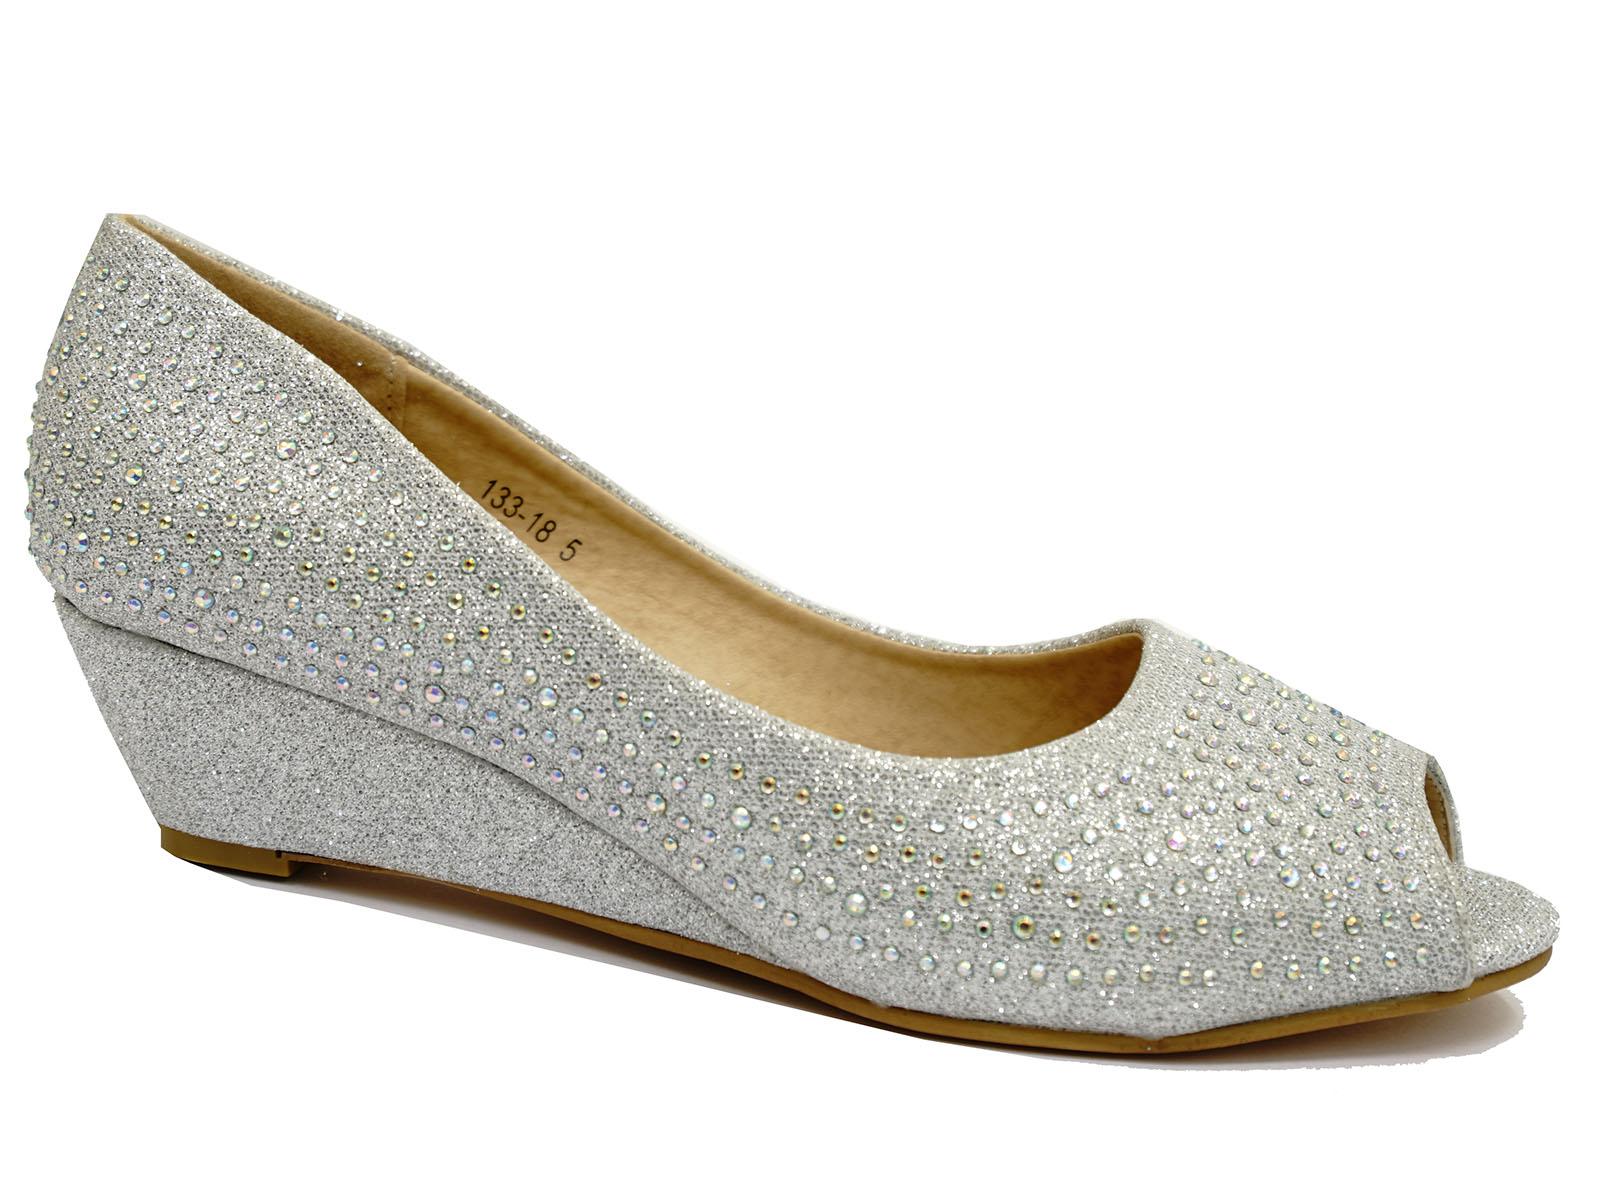 Prom Shoes Wedges Uk